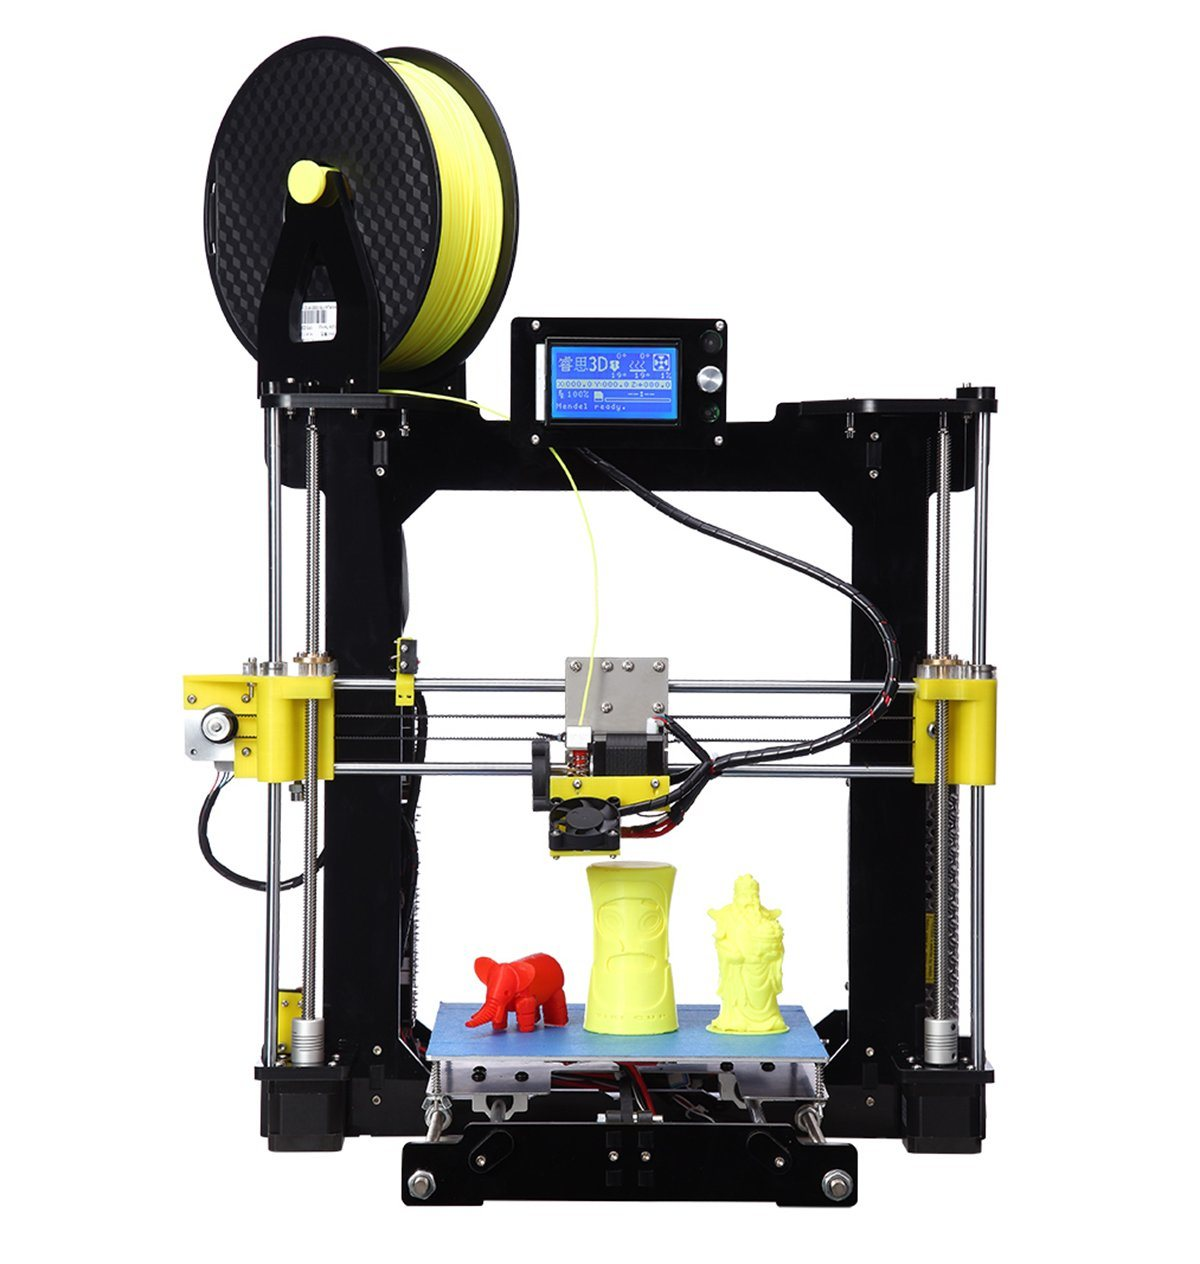 2017 Acrylic Reprap Prusa I3 High Quality DIY 3D Printer